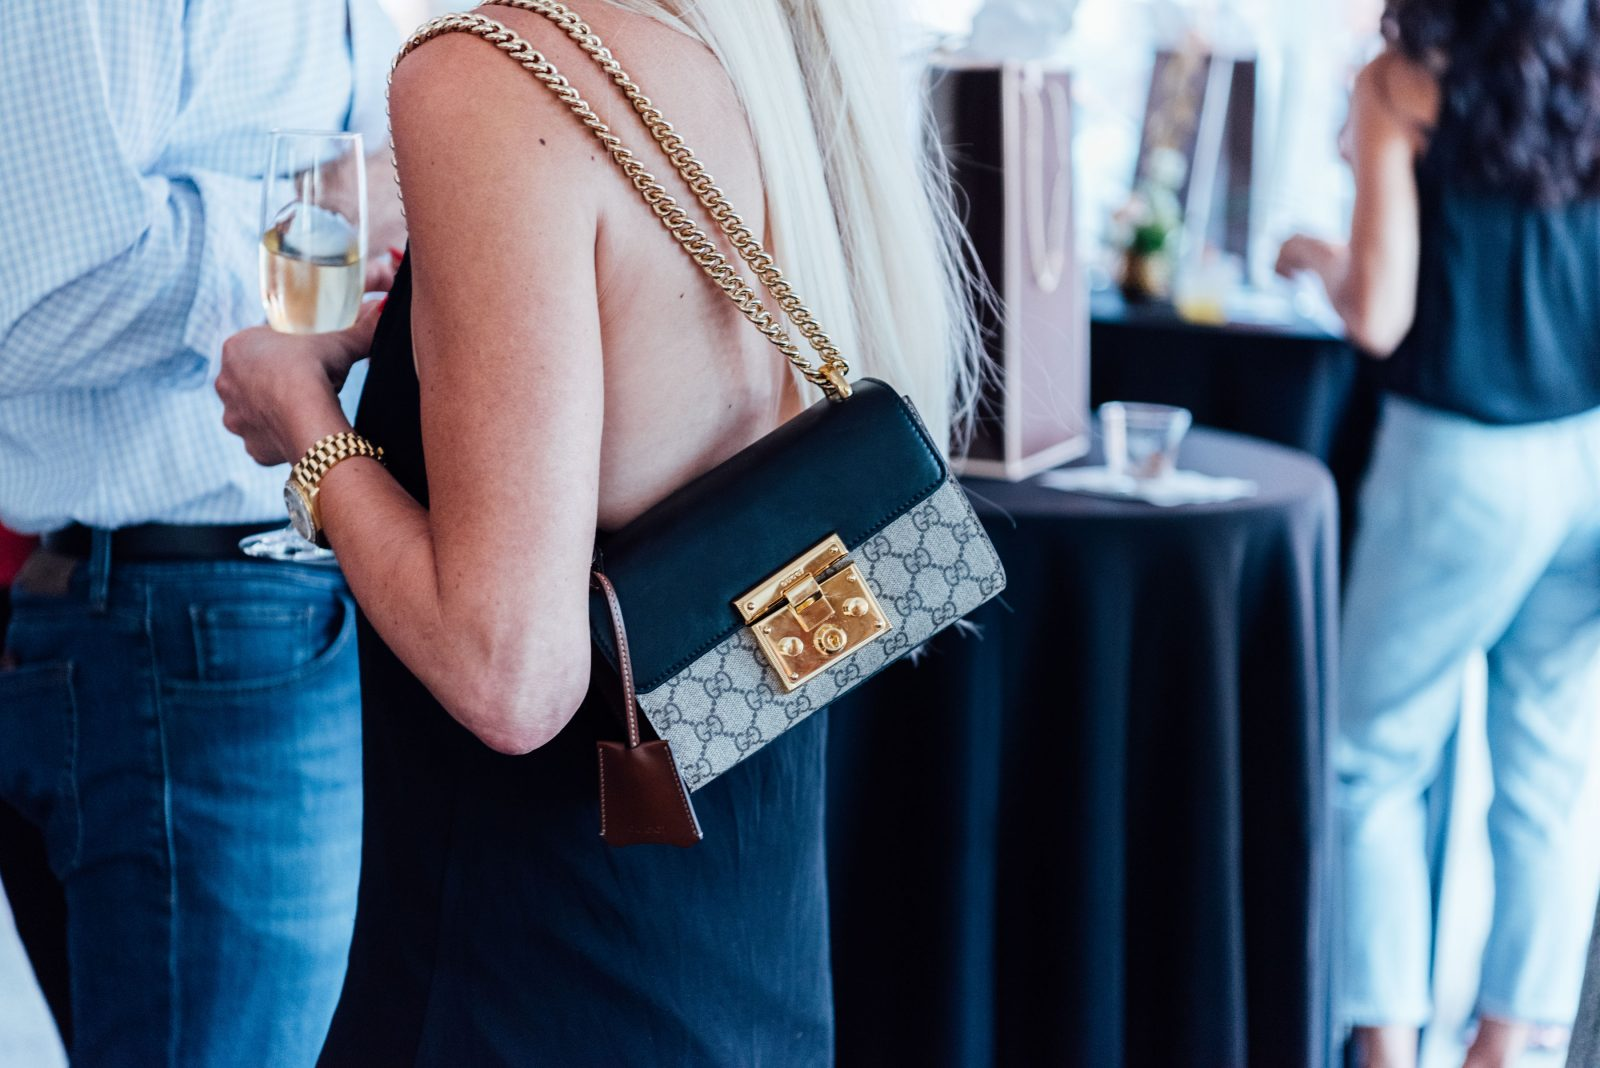 Vincent peach fine jewelry event, channel handbag